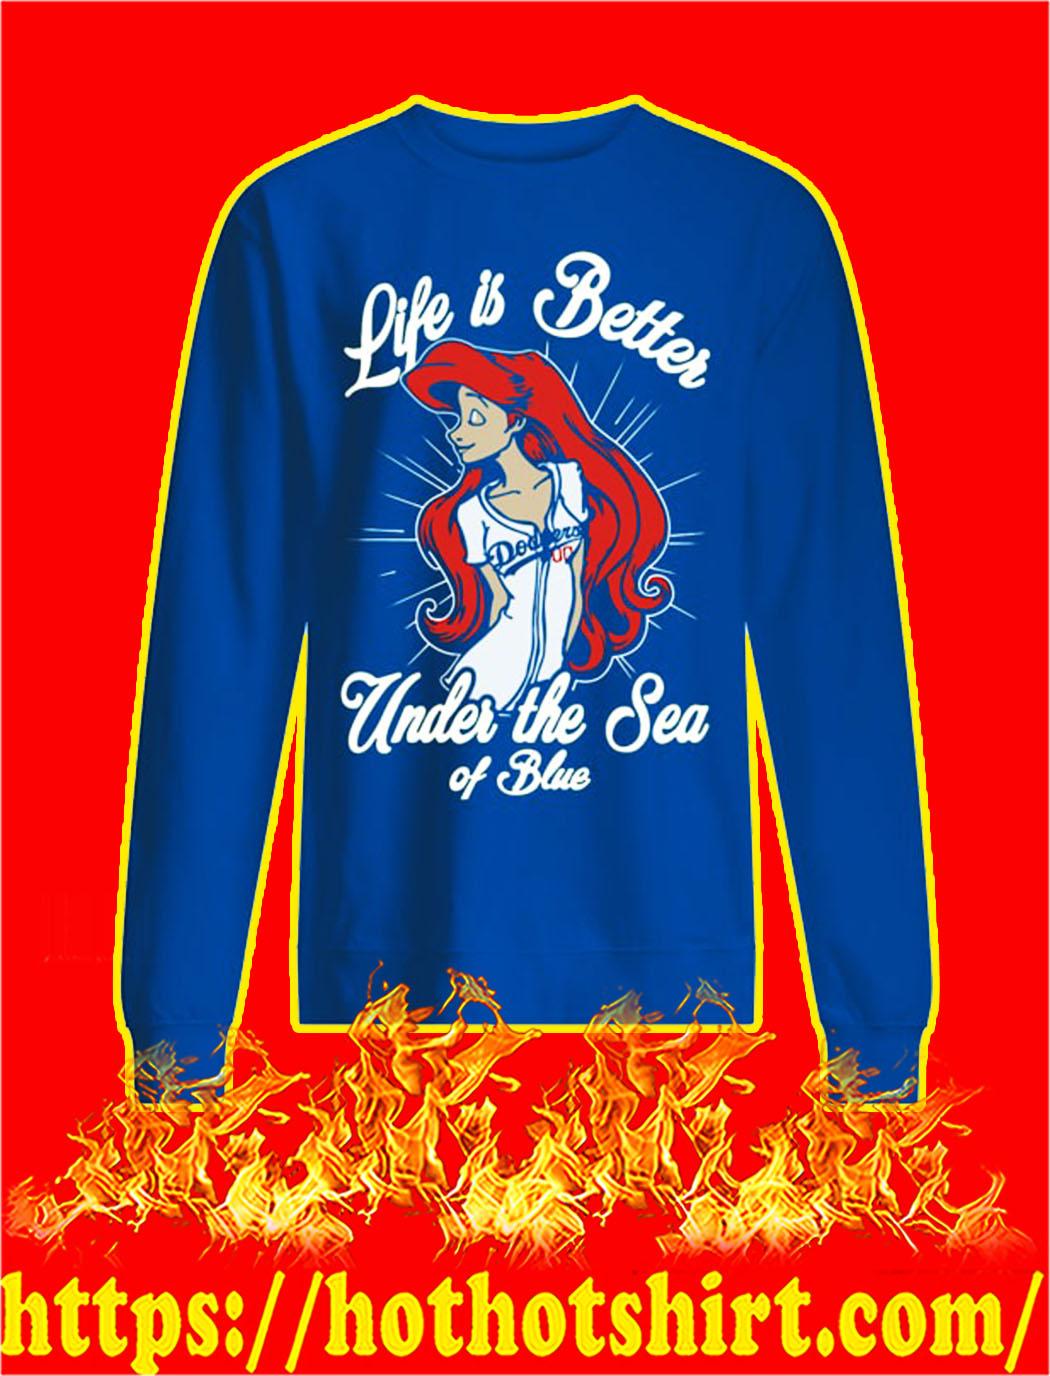 Ariel dodgers life is better under the sea of blue sweatshirt